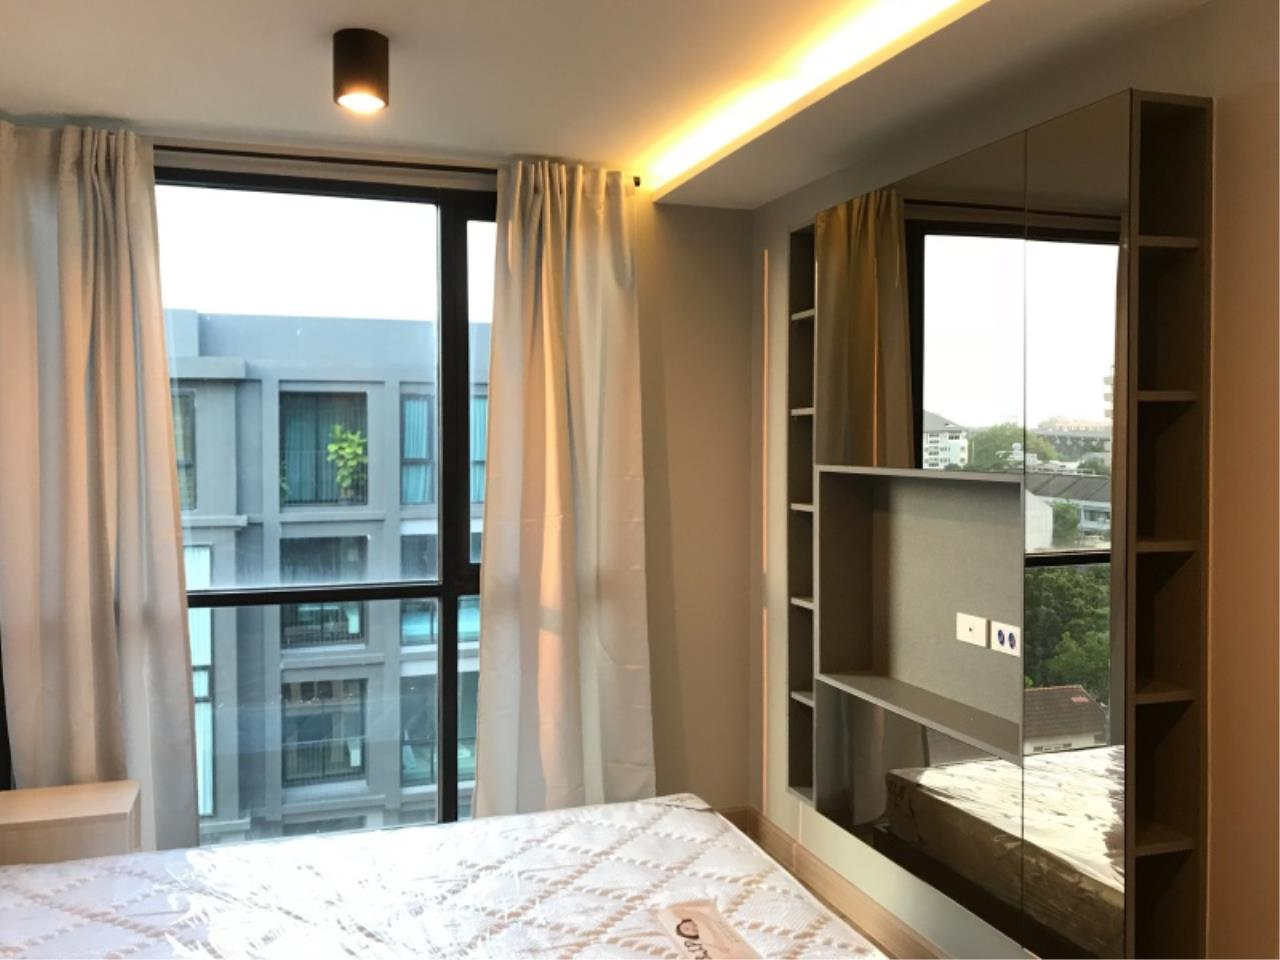 Century21 Skylux Agency's The Unique Sukhumvit 62/1 / Condo For Sale / 1 Bedroom / 33 SQM / BTS Bang Chak / Bangkok 3